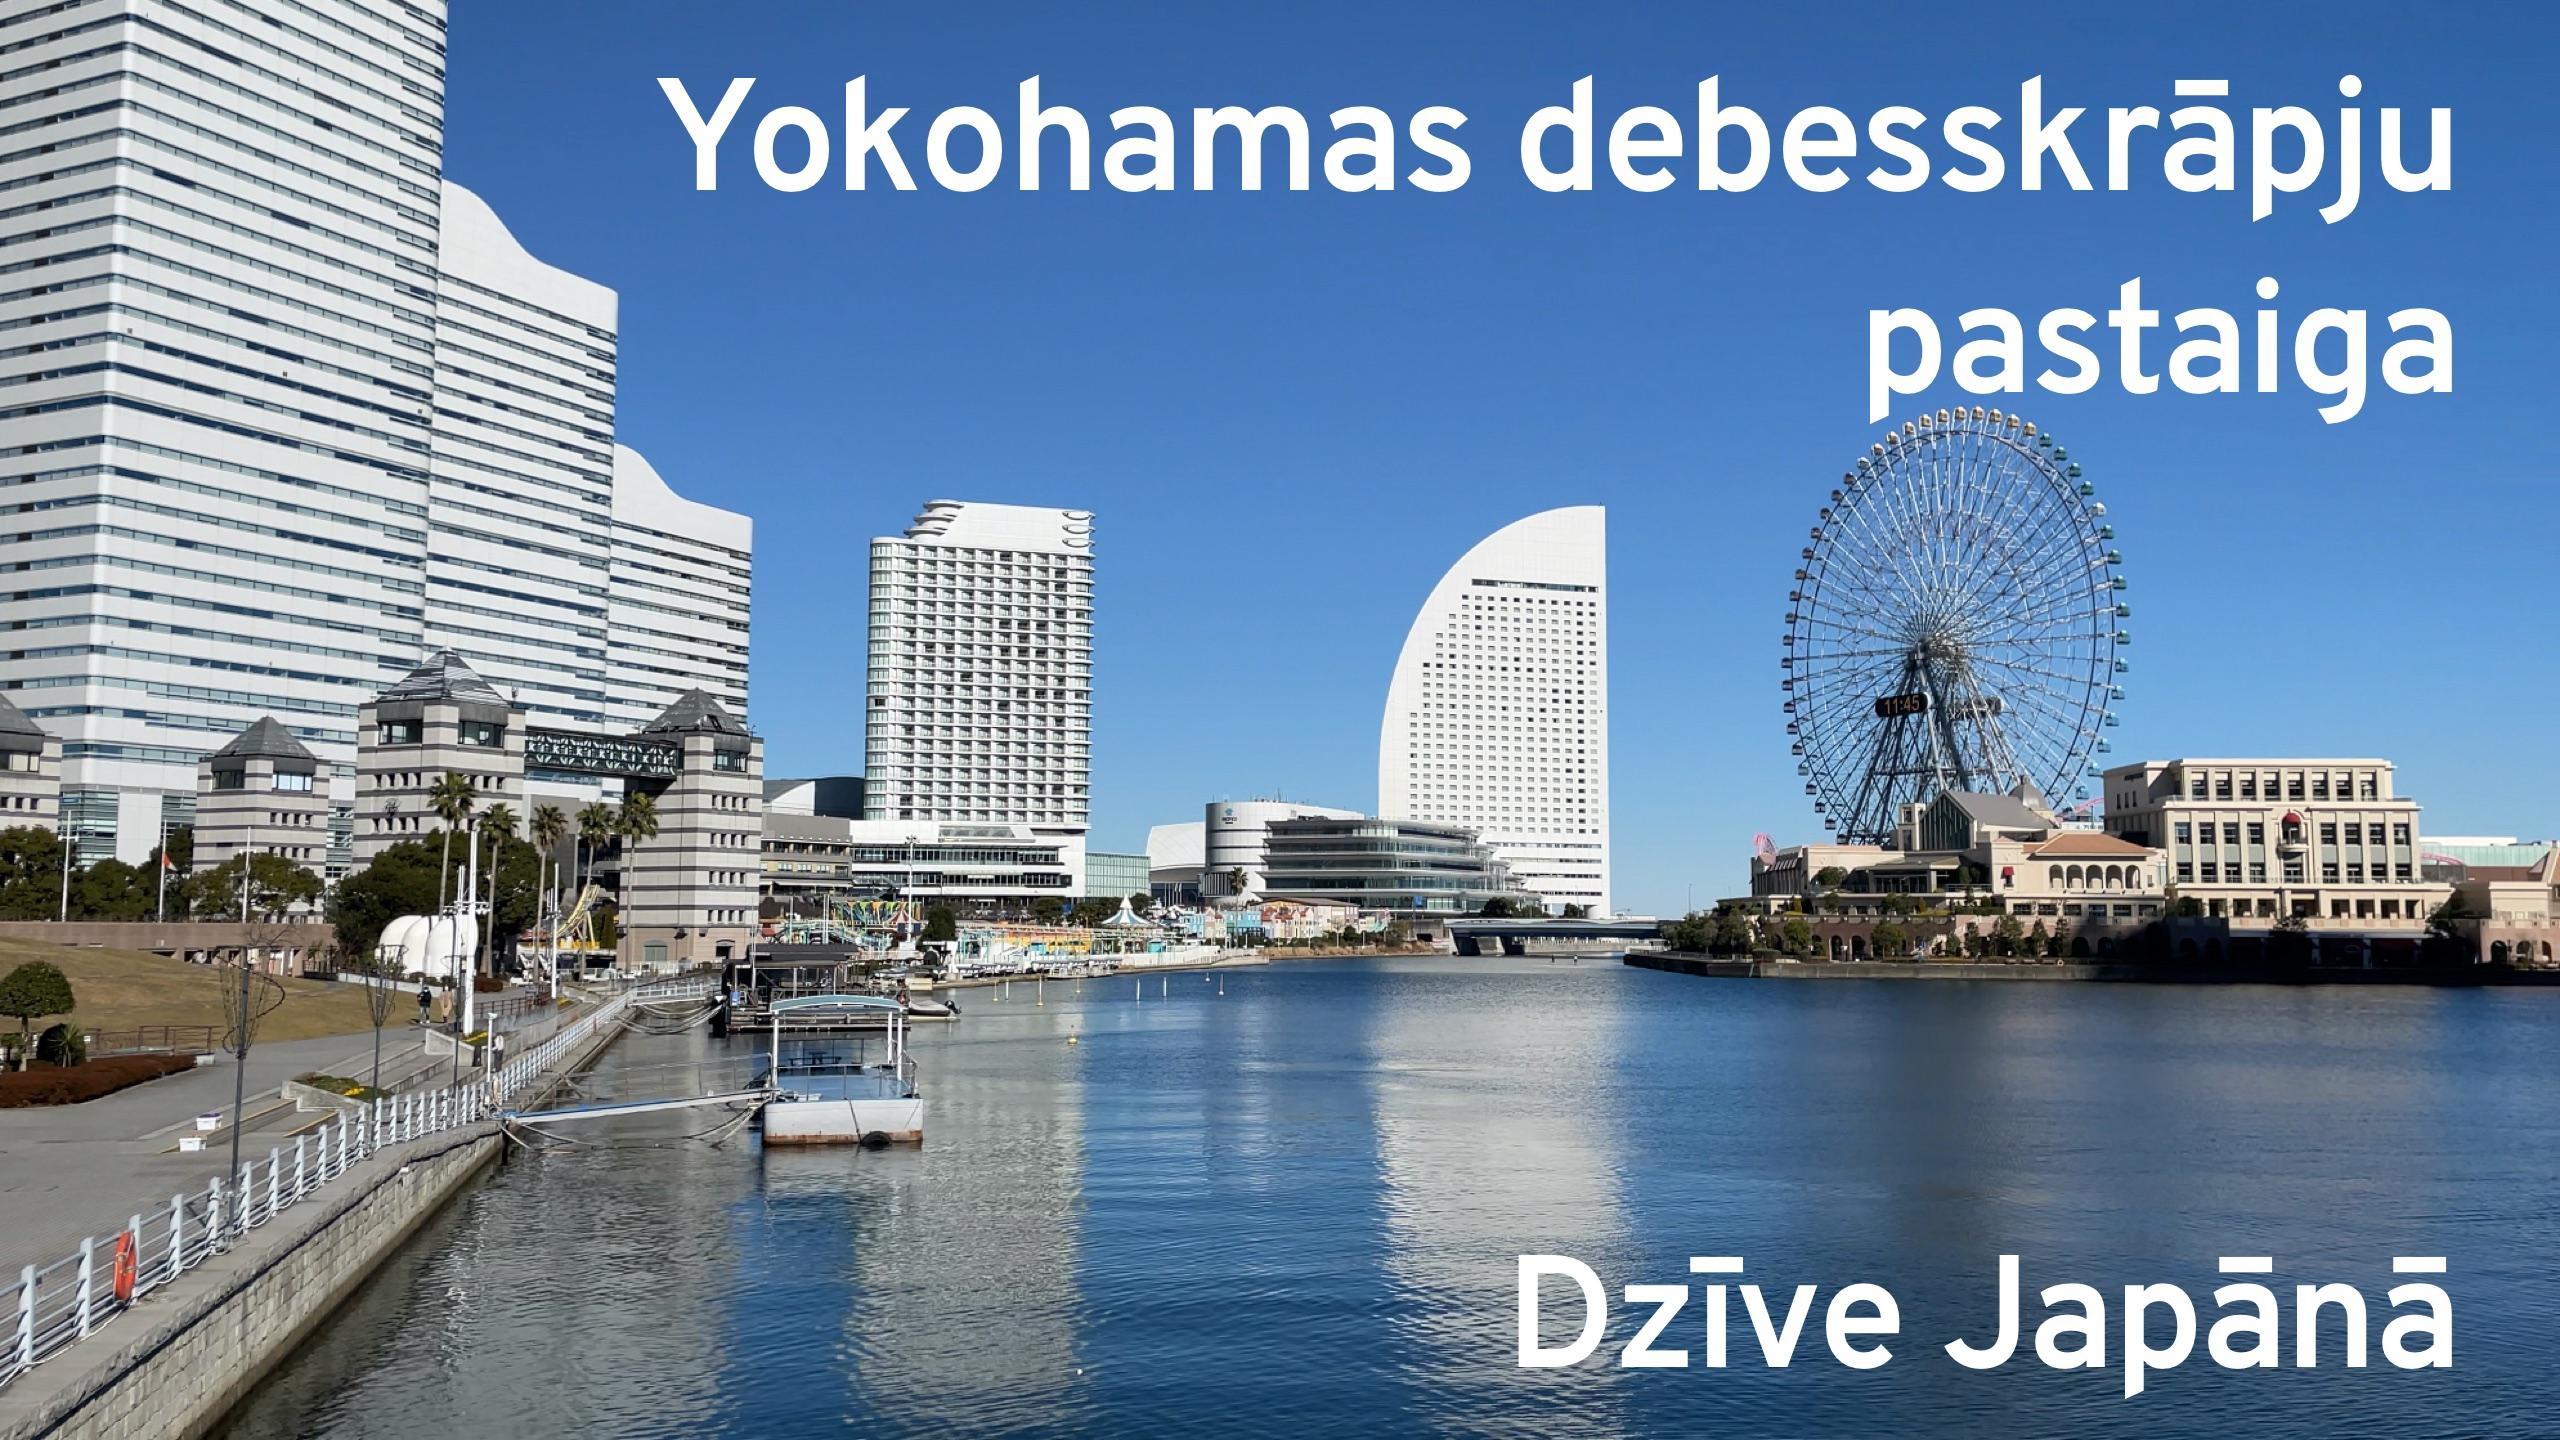 Video: Yokohamas debesskrāpju pastaiga